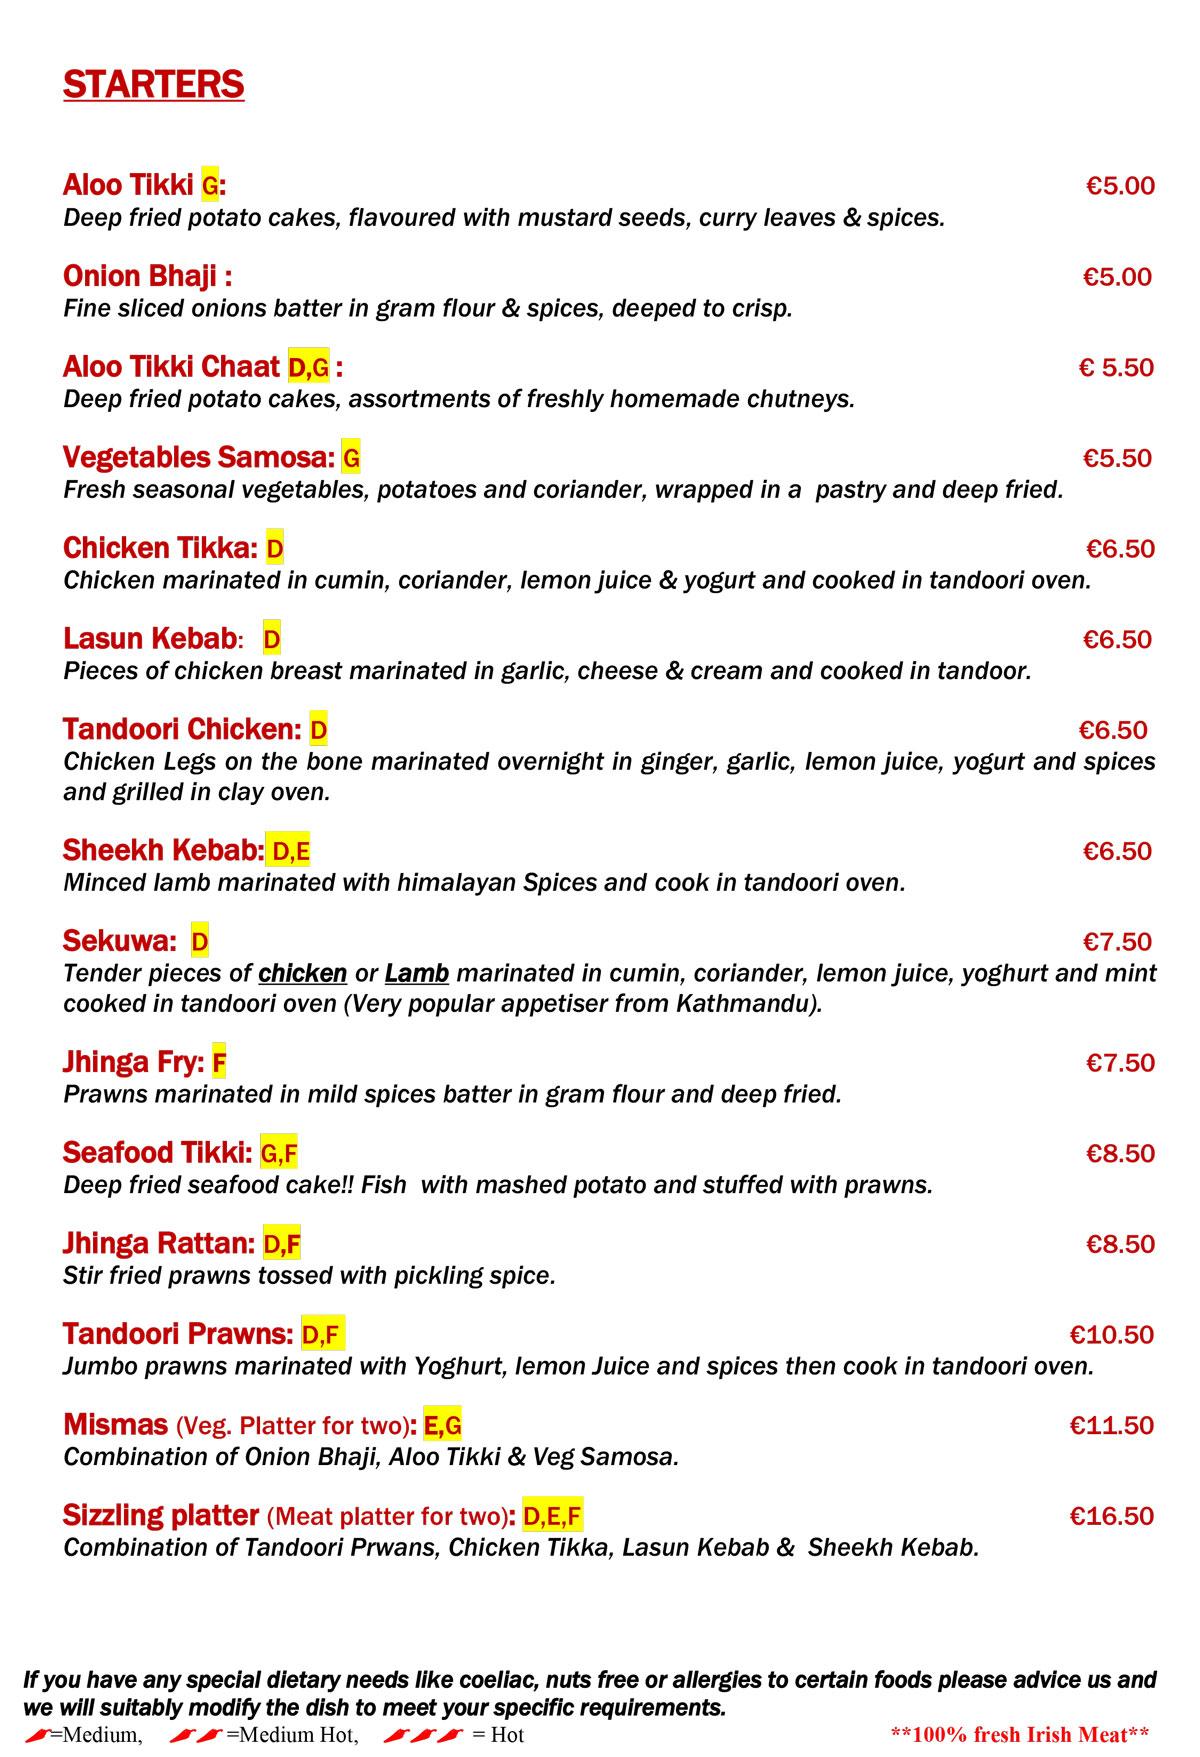 Restaurant Menu- Take Glimse of Kashmir Menu | Kashmir